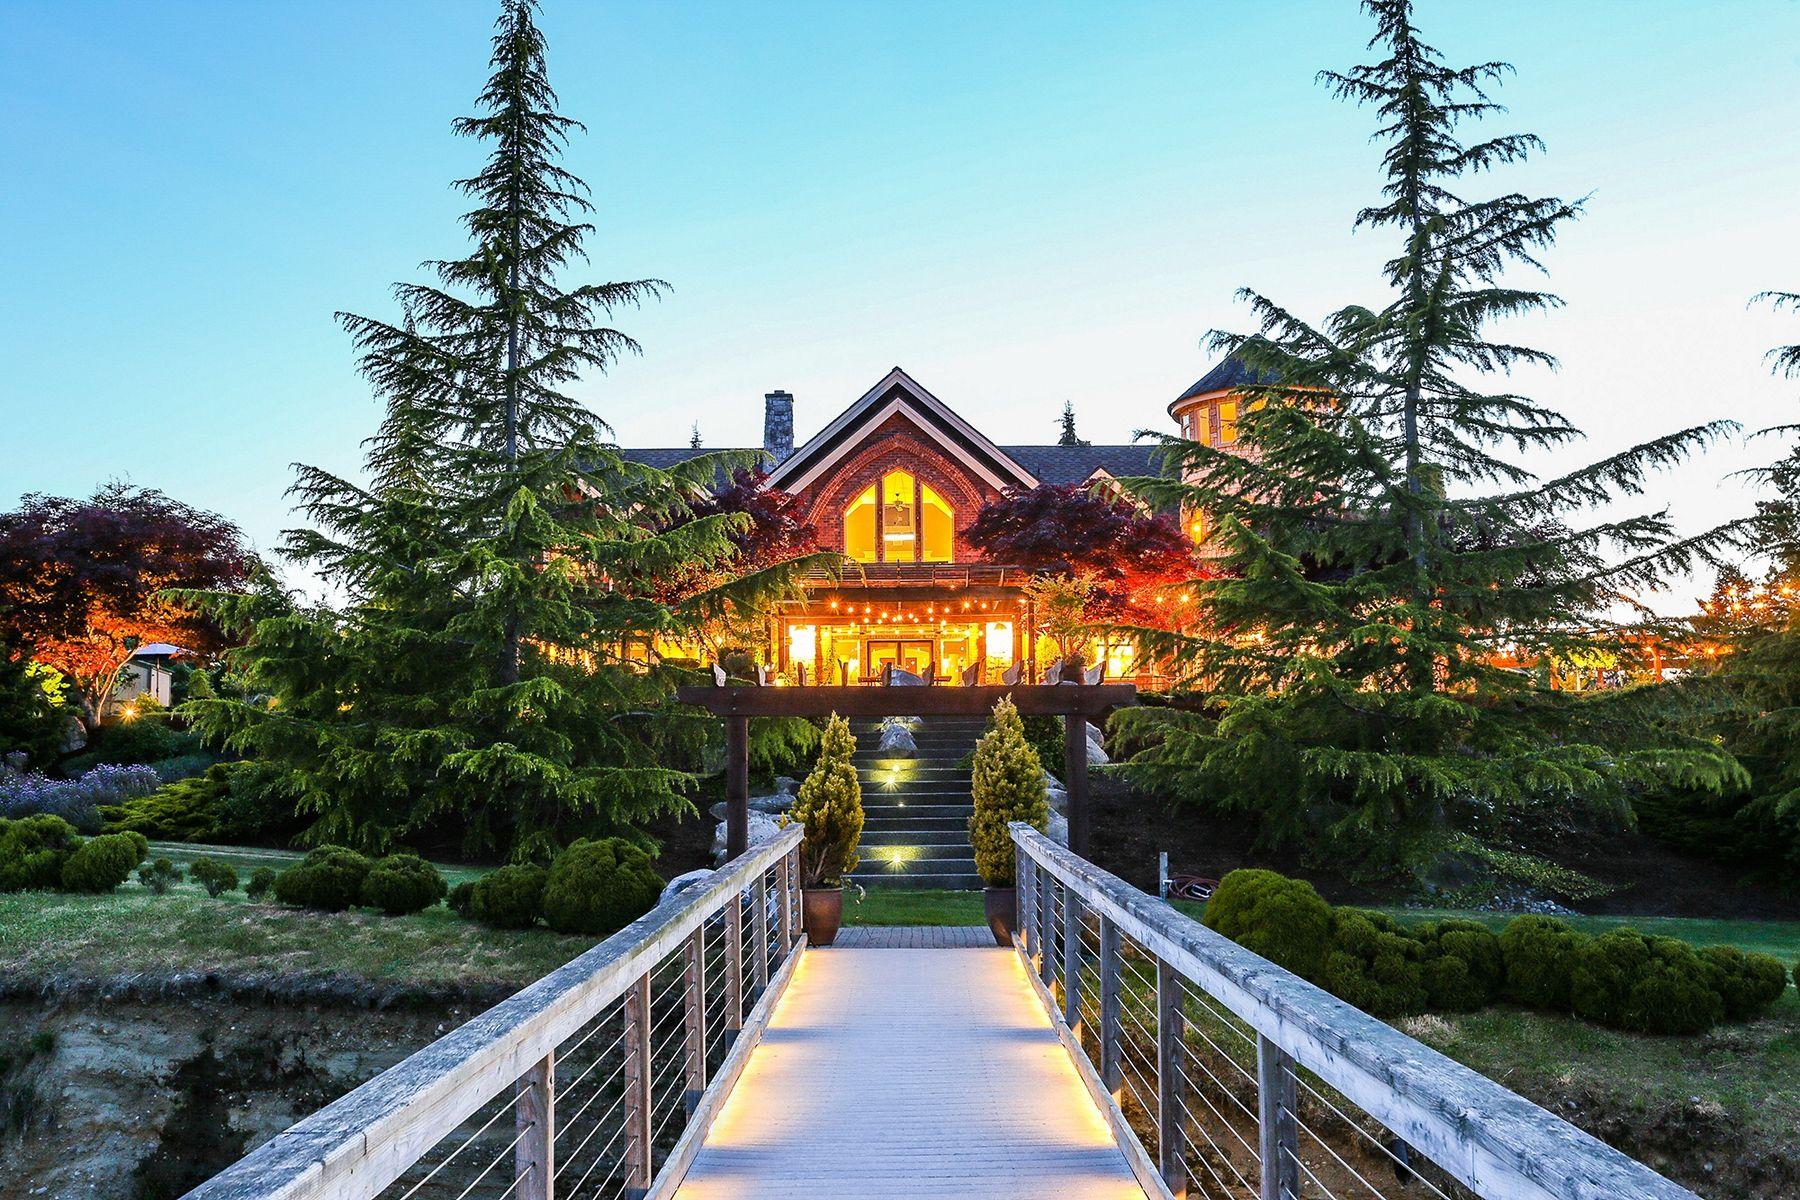 Single Family Homes for Sale at 1259 14th Ave, Fox Island, WA 98333 1259 14th Ave Fox Island, Washington 98333 United States